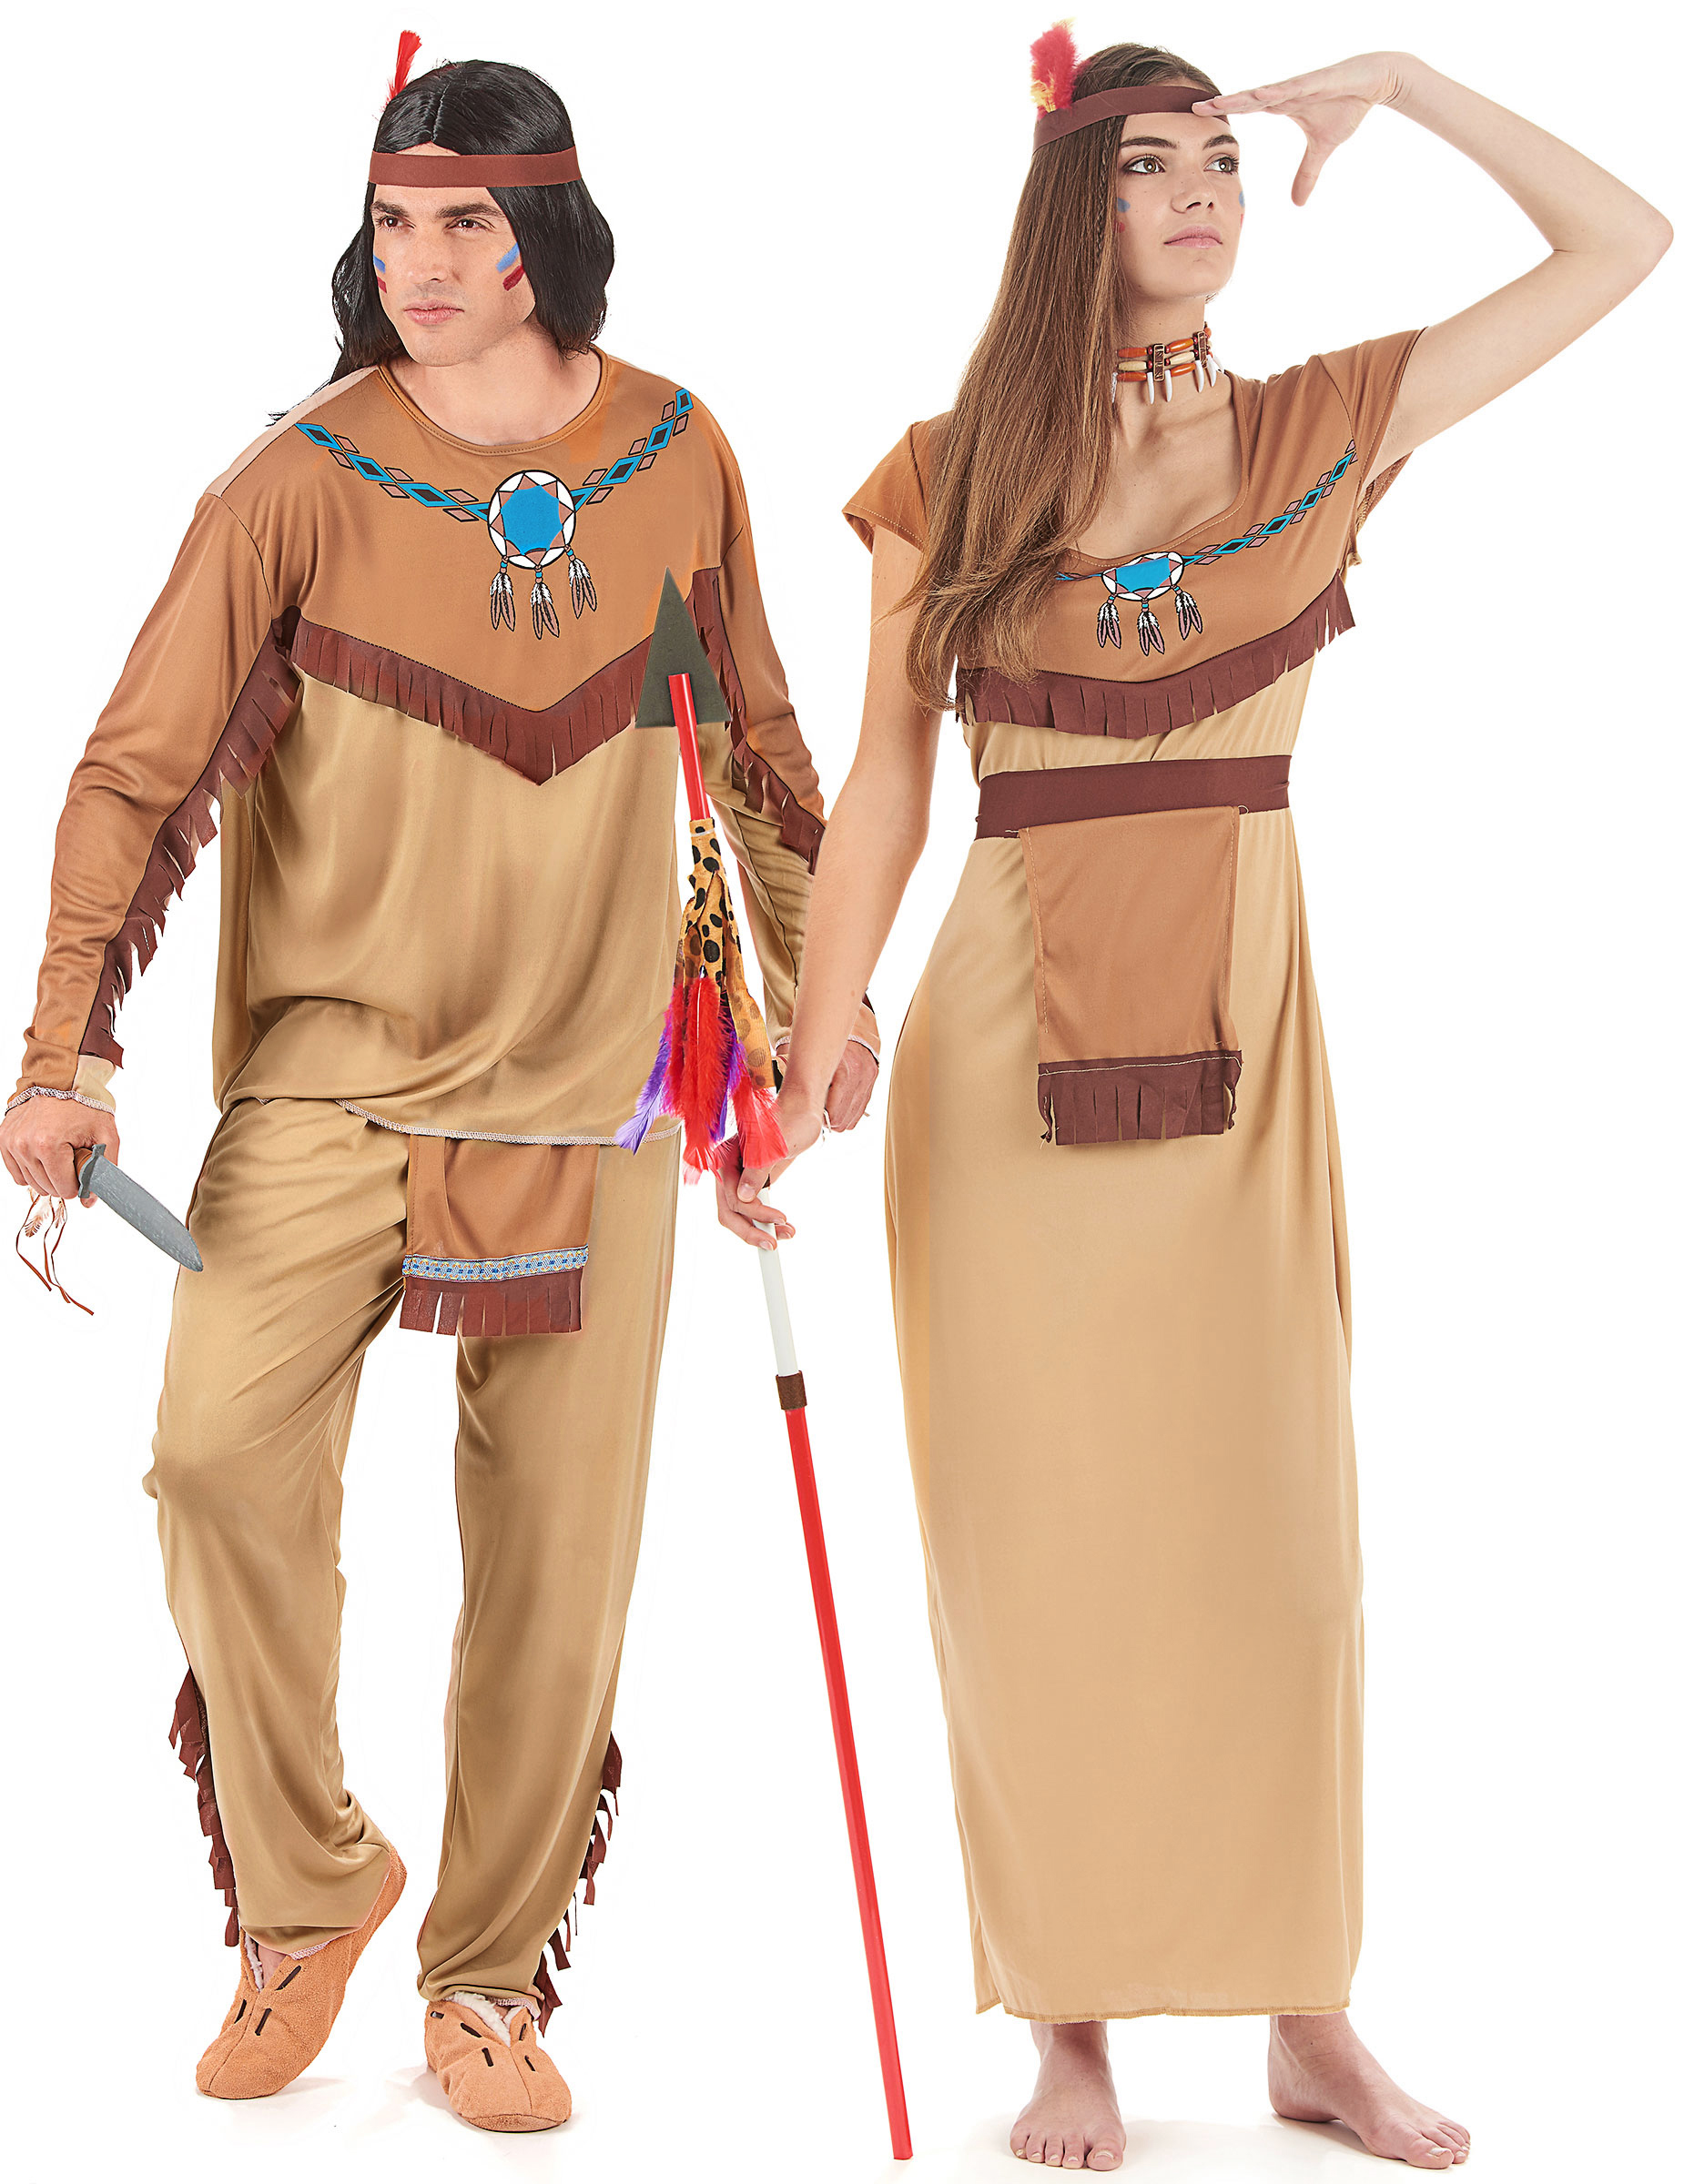 Günstige Partnerkostüme Und Gute Kostümideen Bei Vegaoo